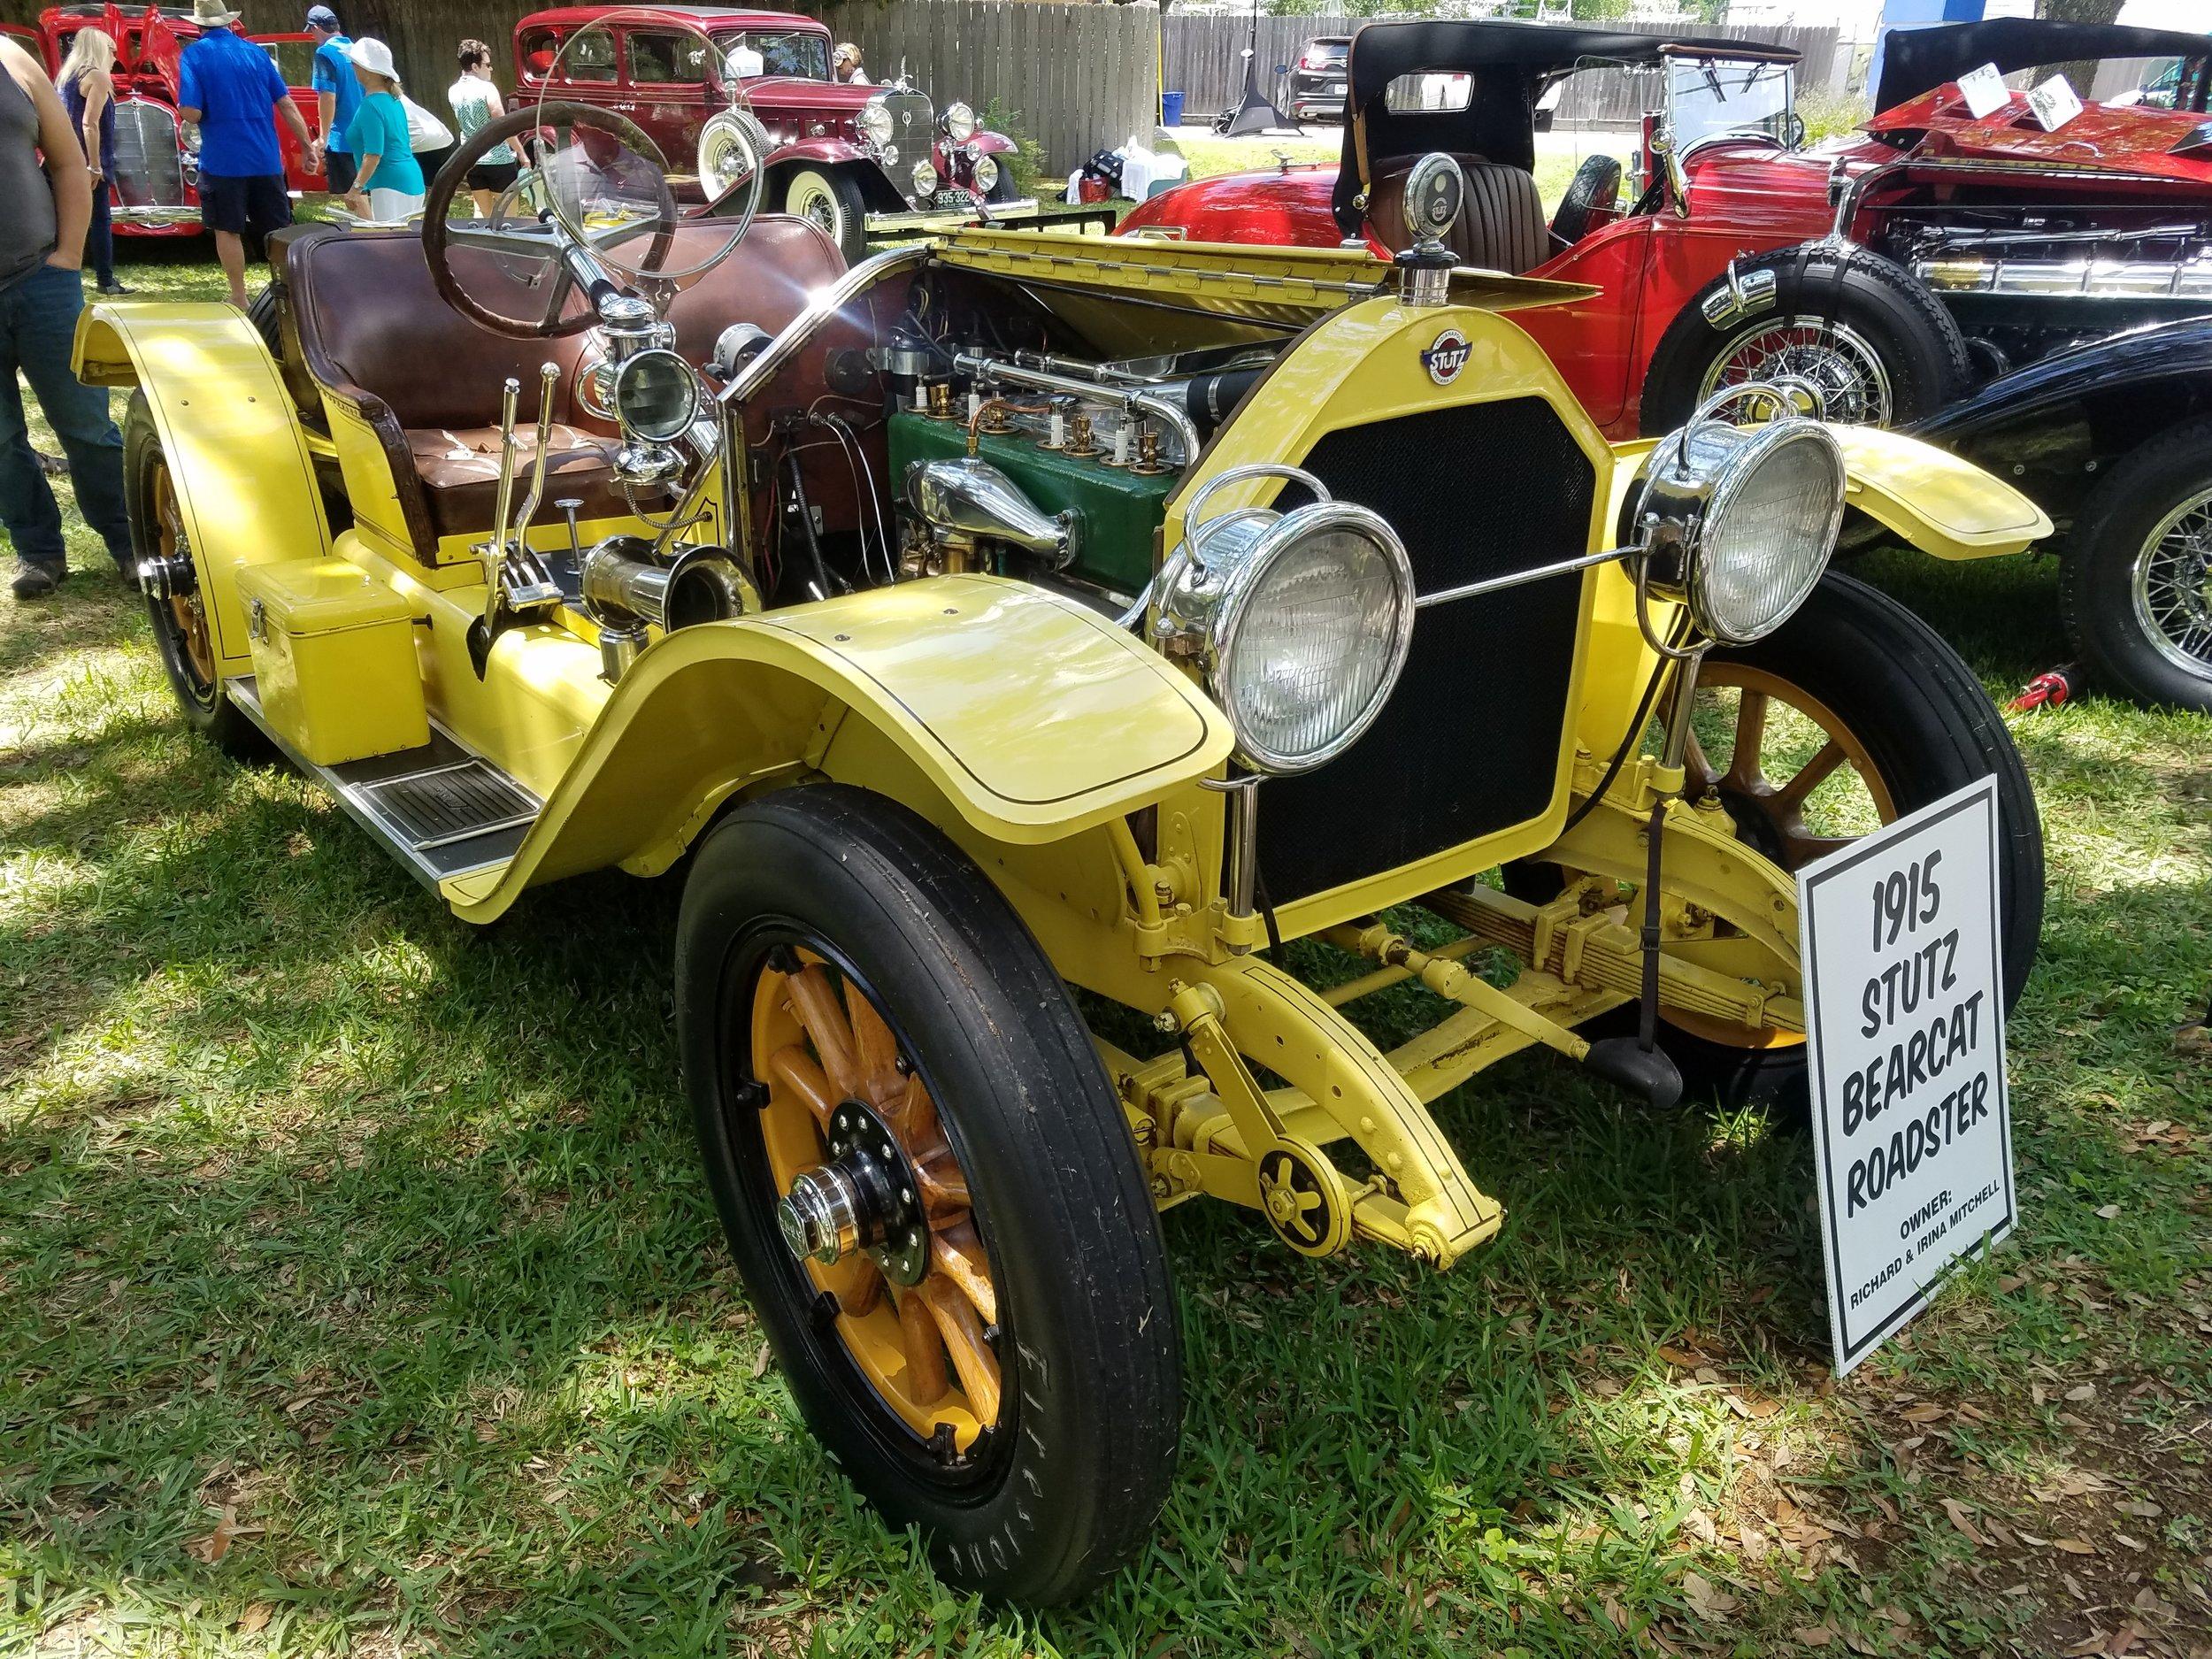 1915 Stutz Bearcat Roadster